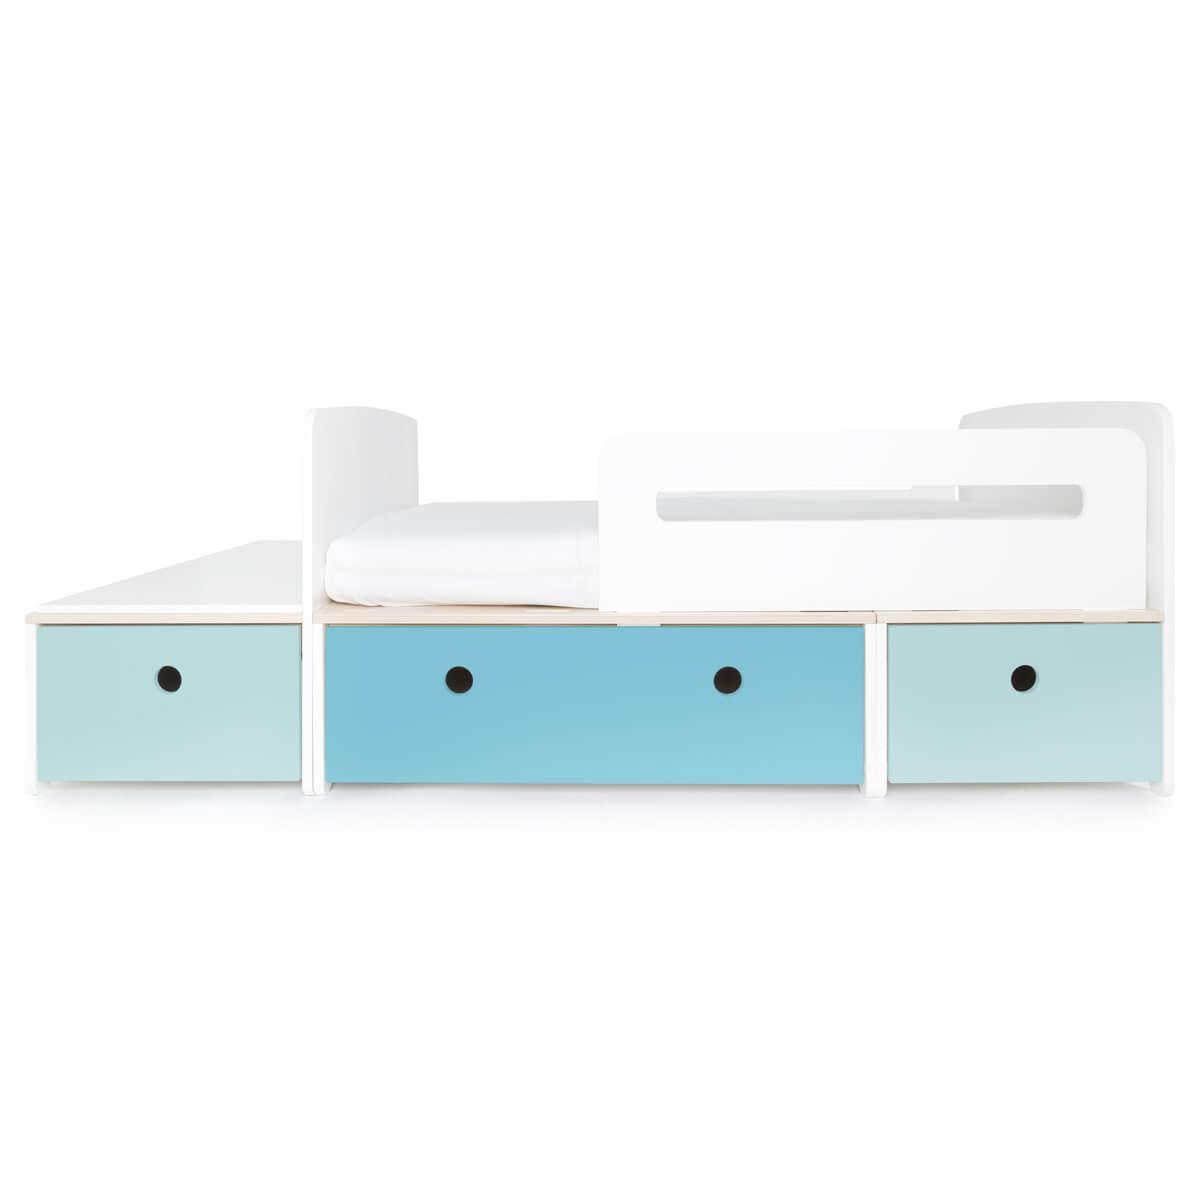 Juniorbett mitwachsend 90x150/200cm COLORFLEX sky blue-paradise blue-sky blue